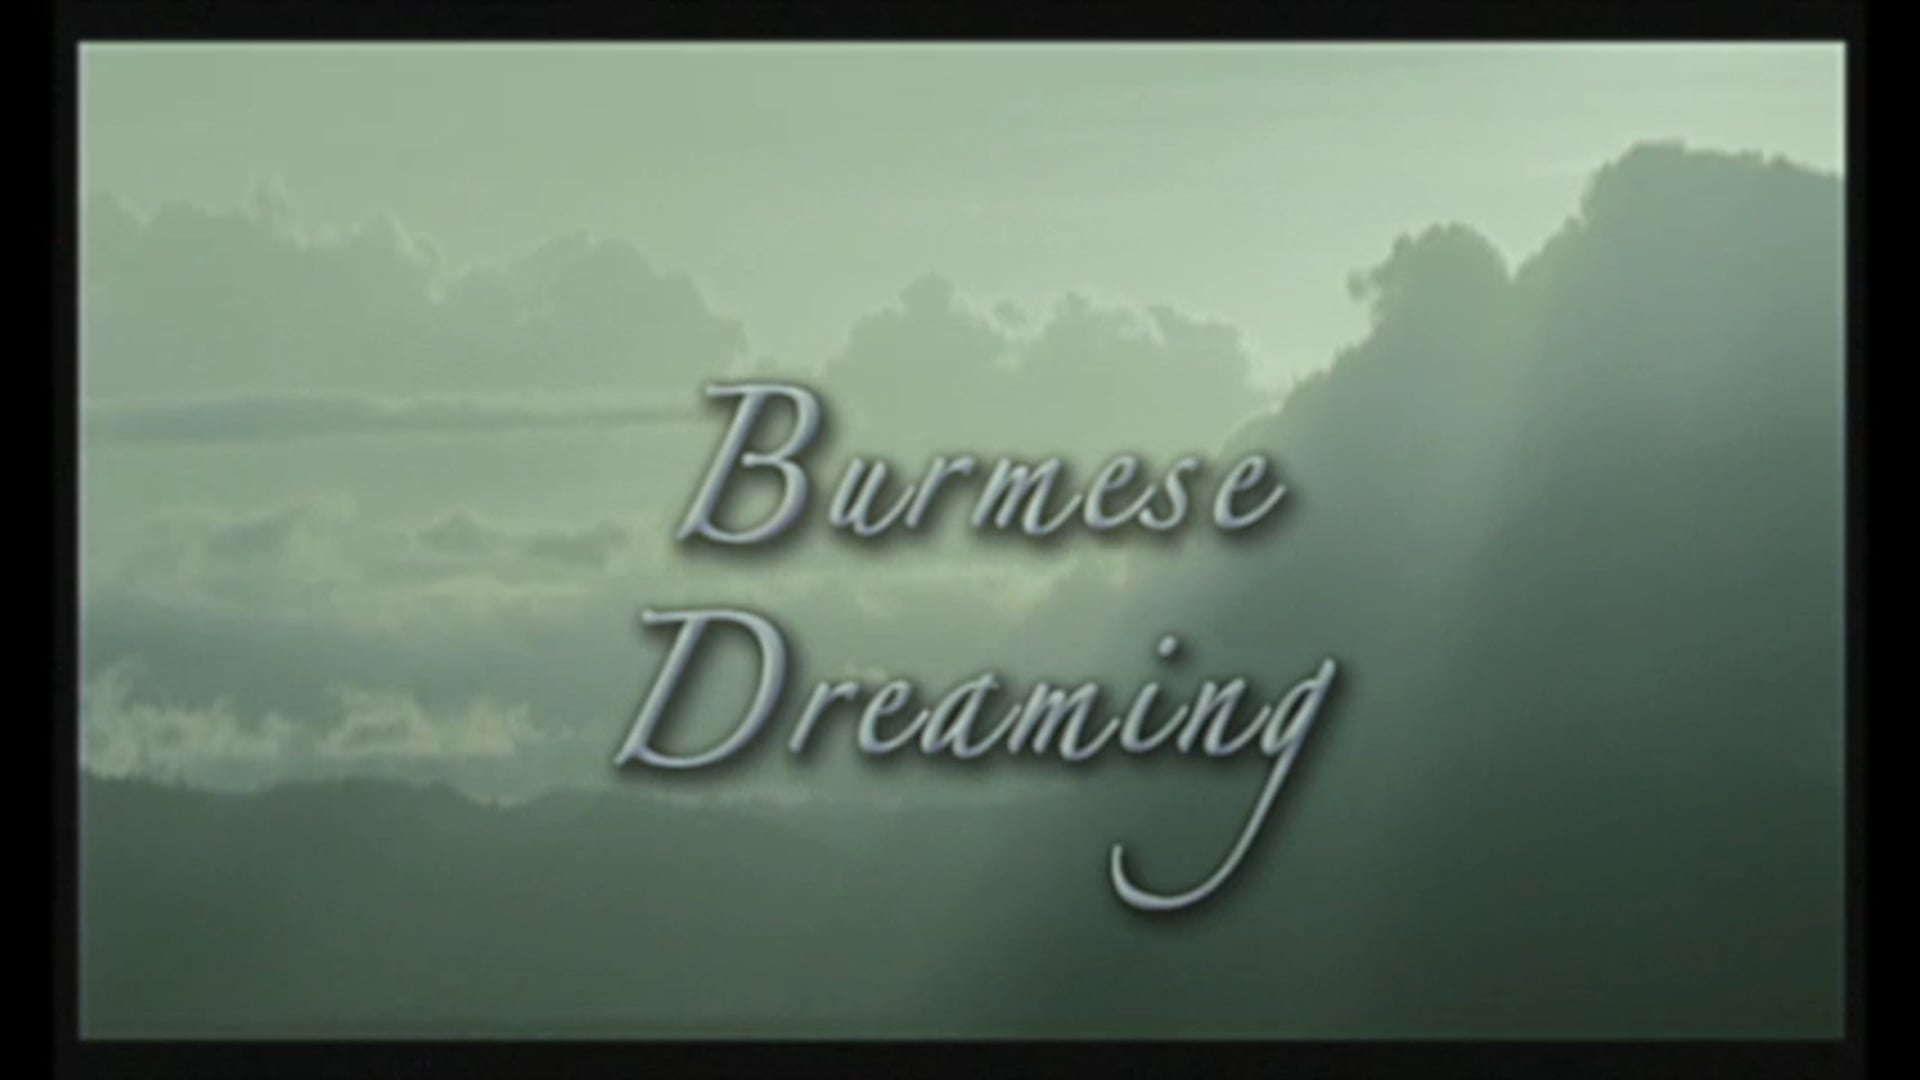 Burmese Dreaming, A Documentary Poem